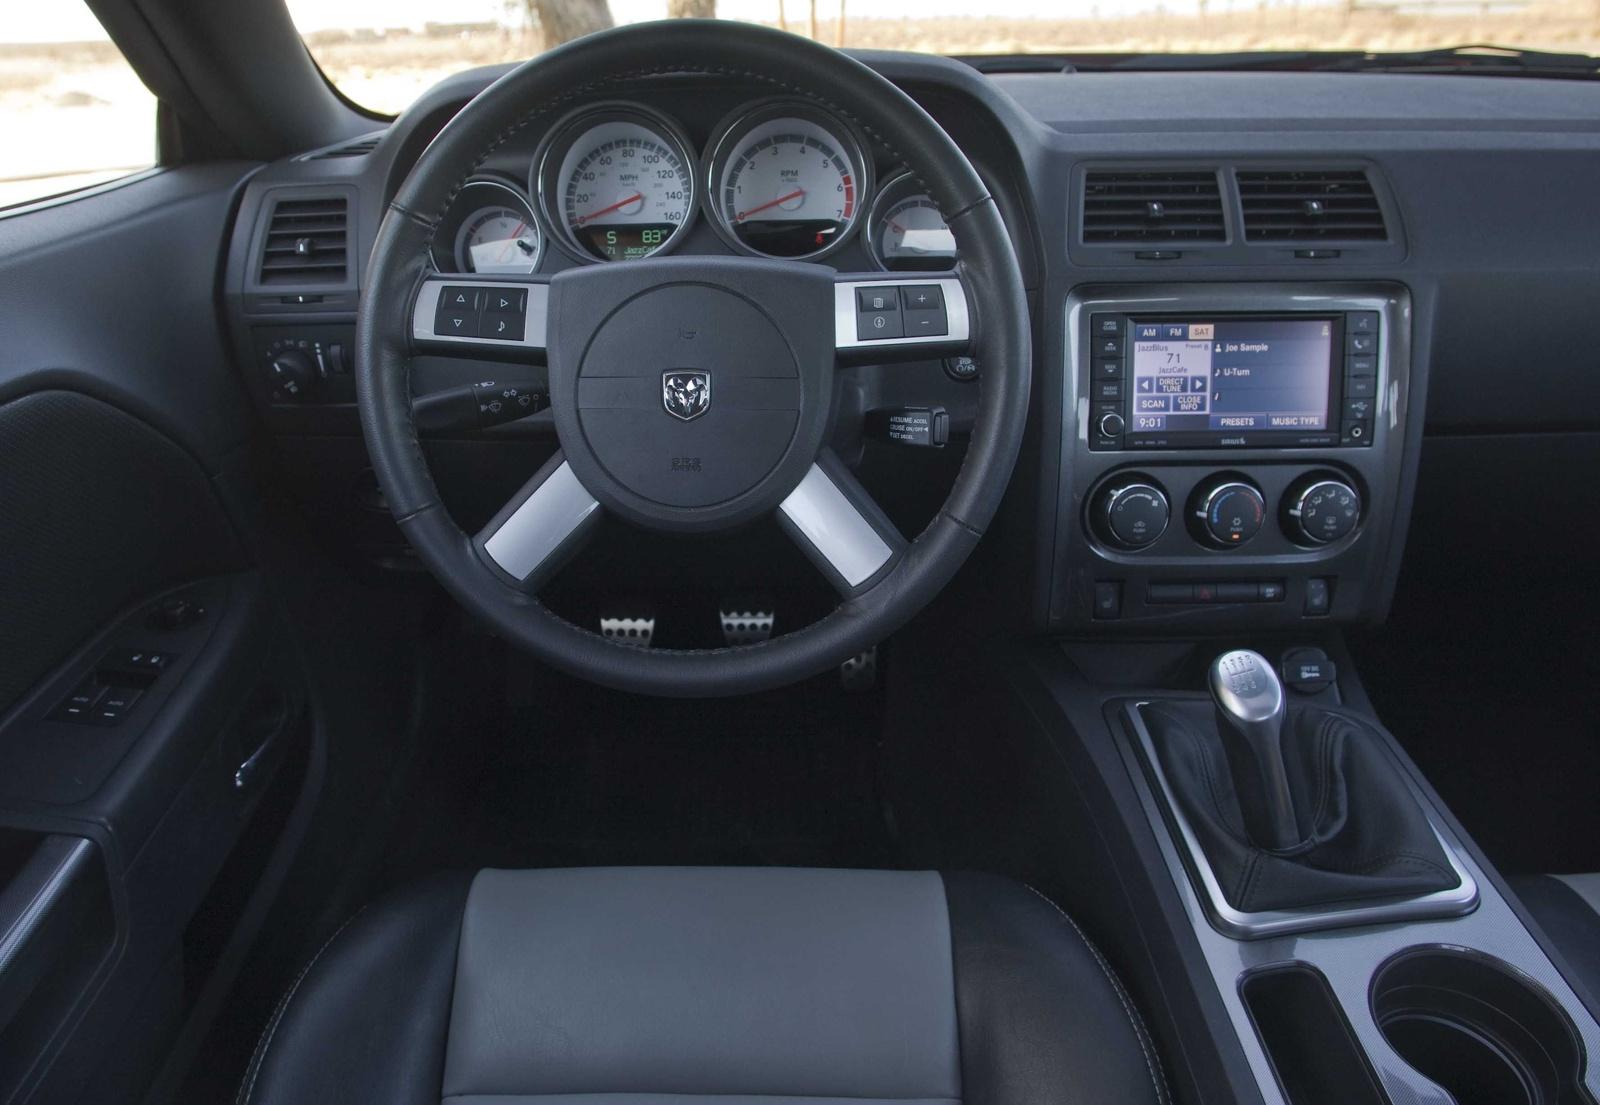 2010 Dodge Challenger SRT8 - Power To Burn - Hot Rod Network  |Dodge Challenger Srt8 2015 Interior